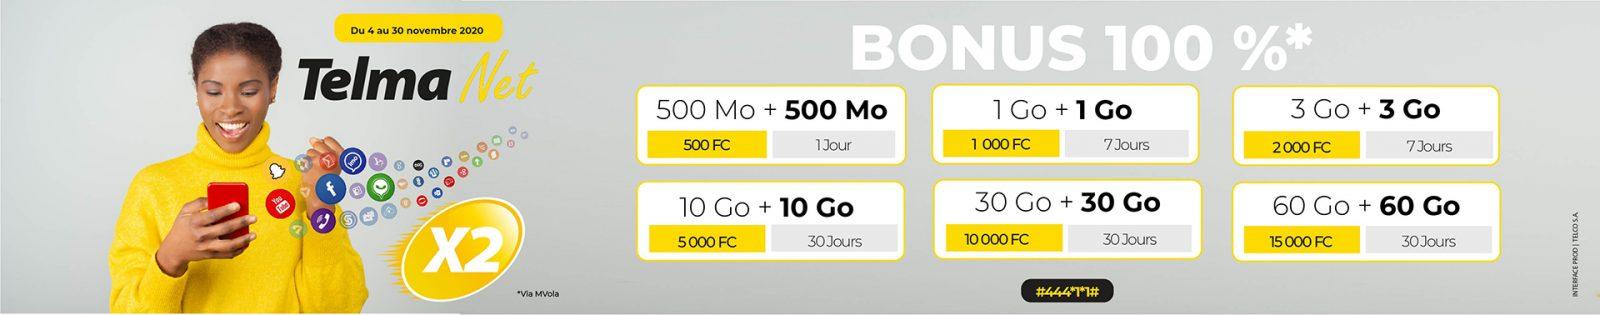 Telma Net 100% Bonus